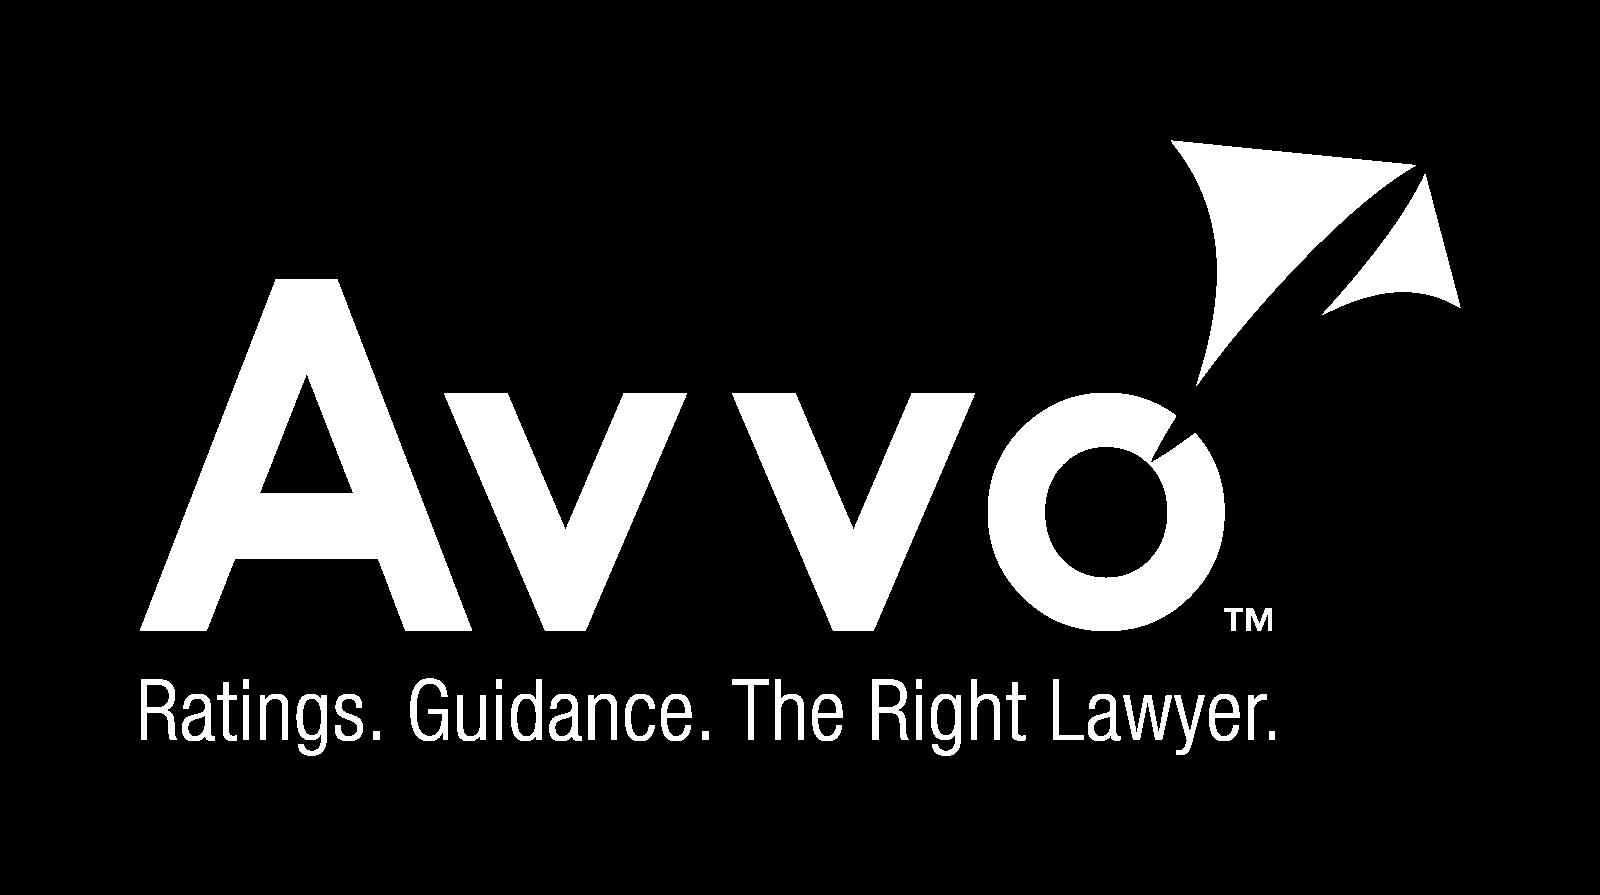 avvo-logo-2